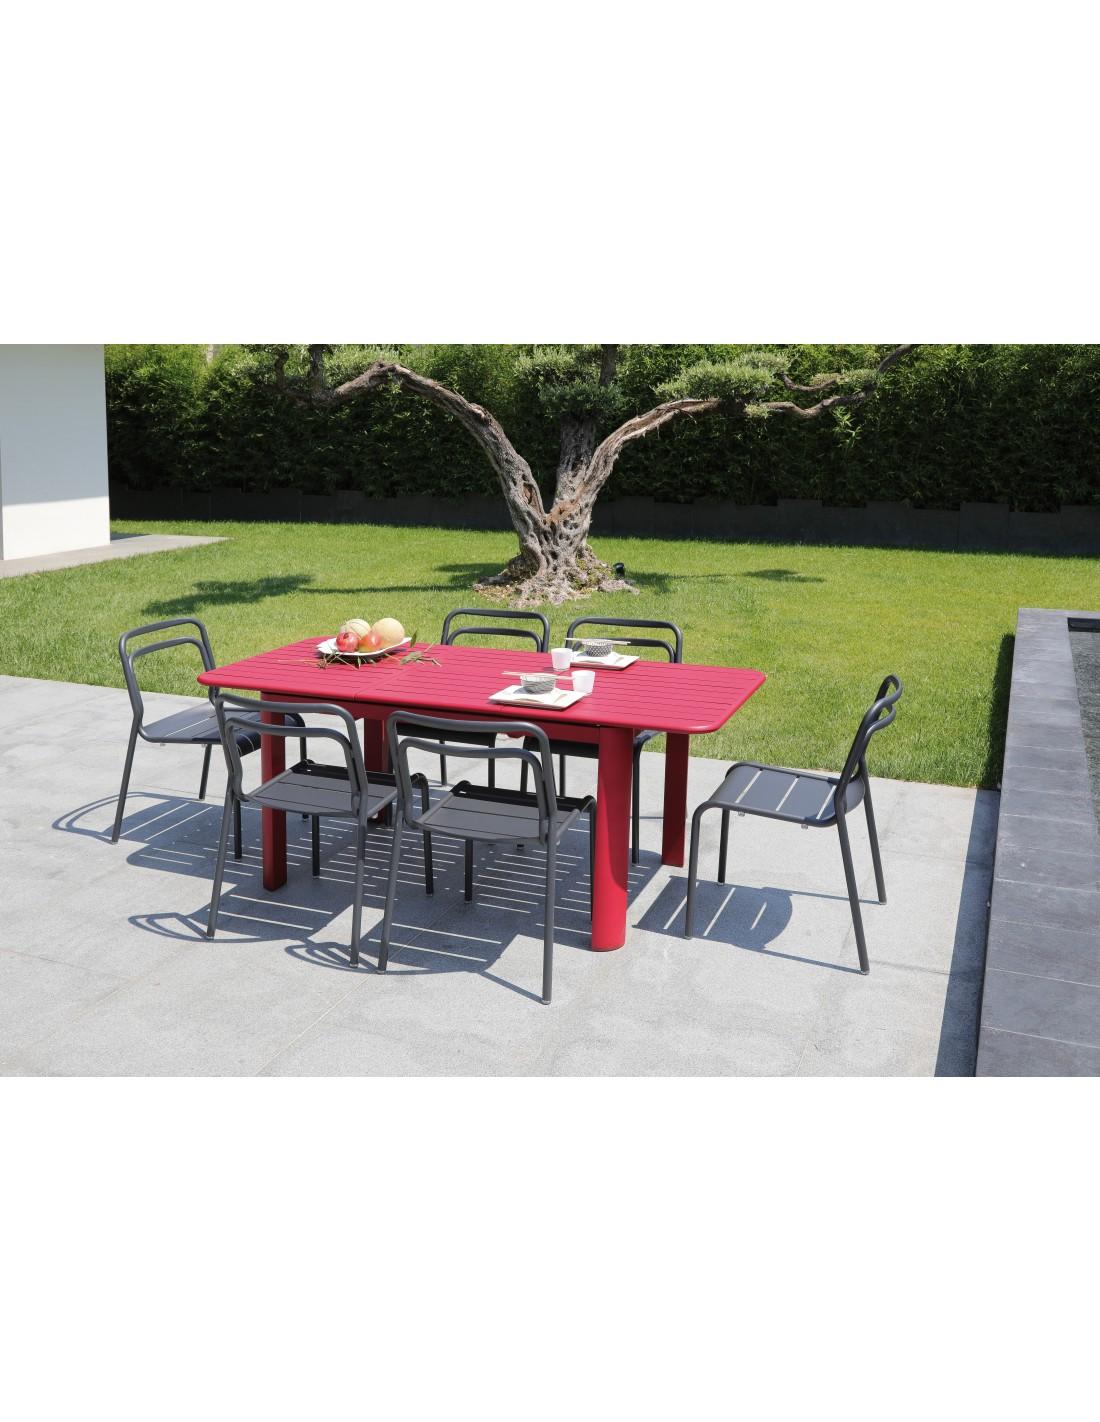 Jardin Extensible Proloisirs Aluminium Table Cm Eos En 130180 De XliuTOkPwZ